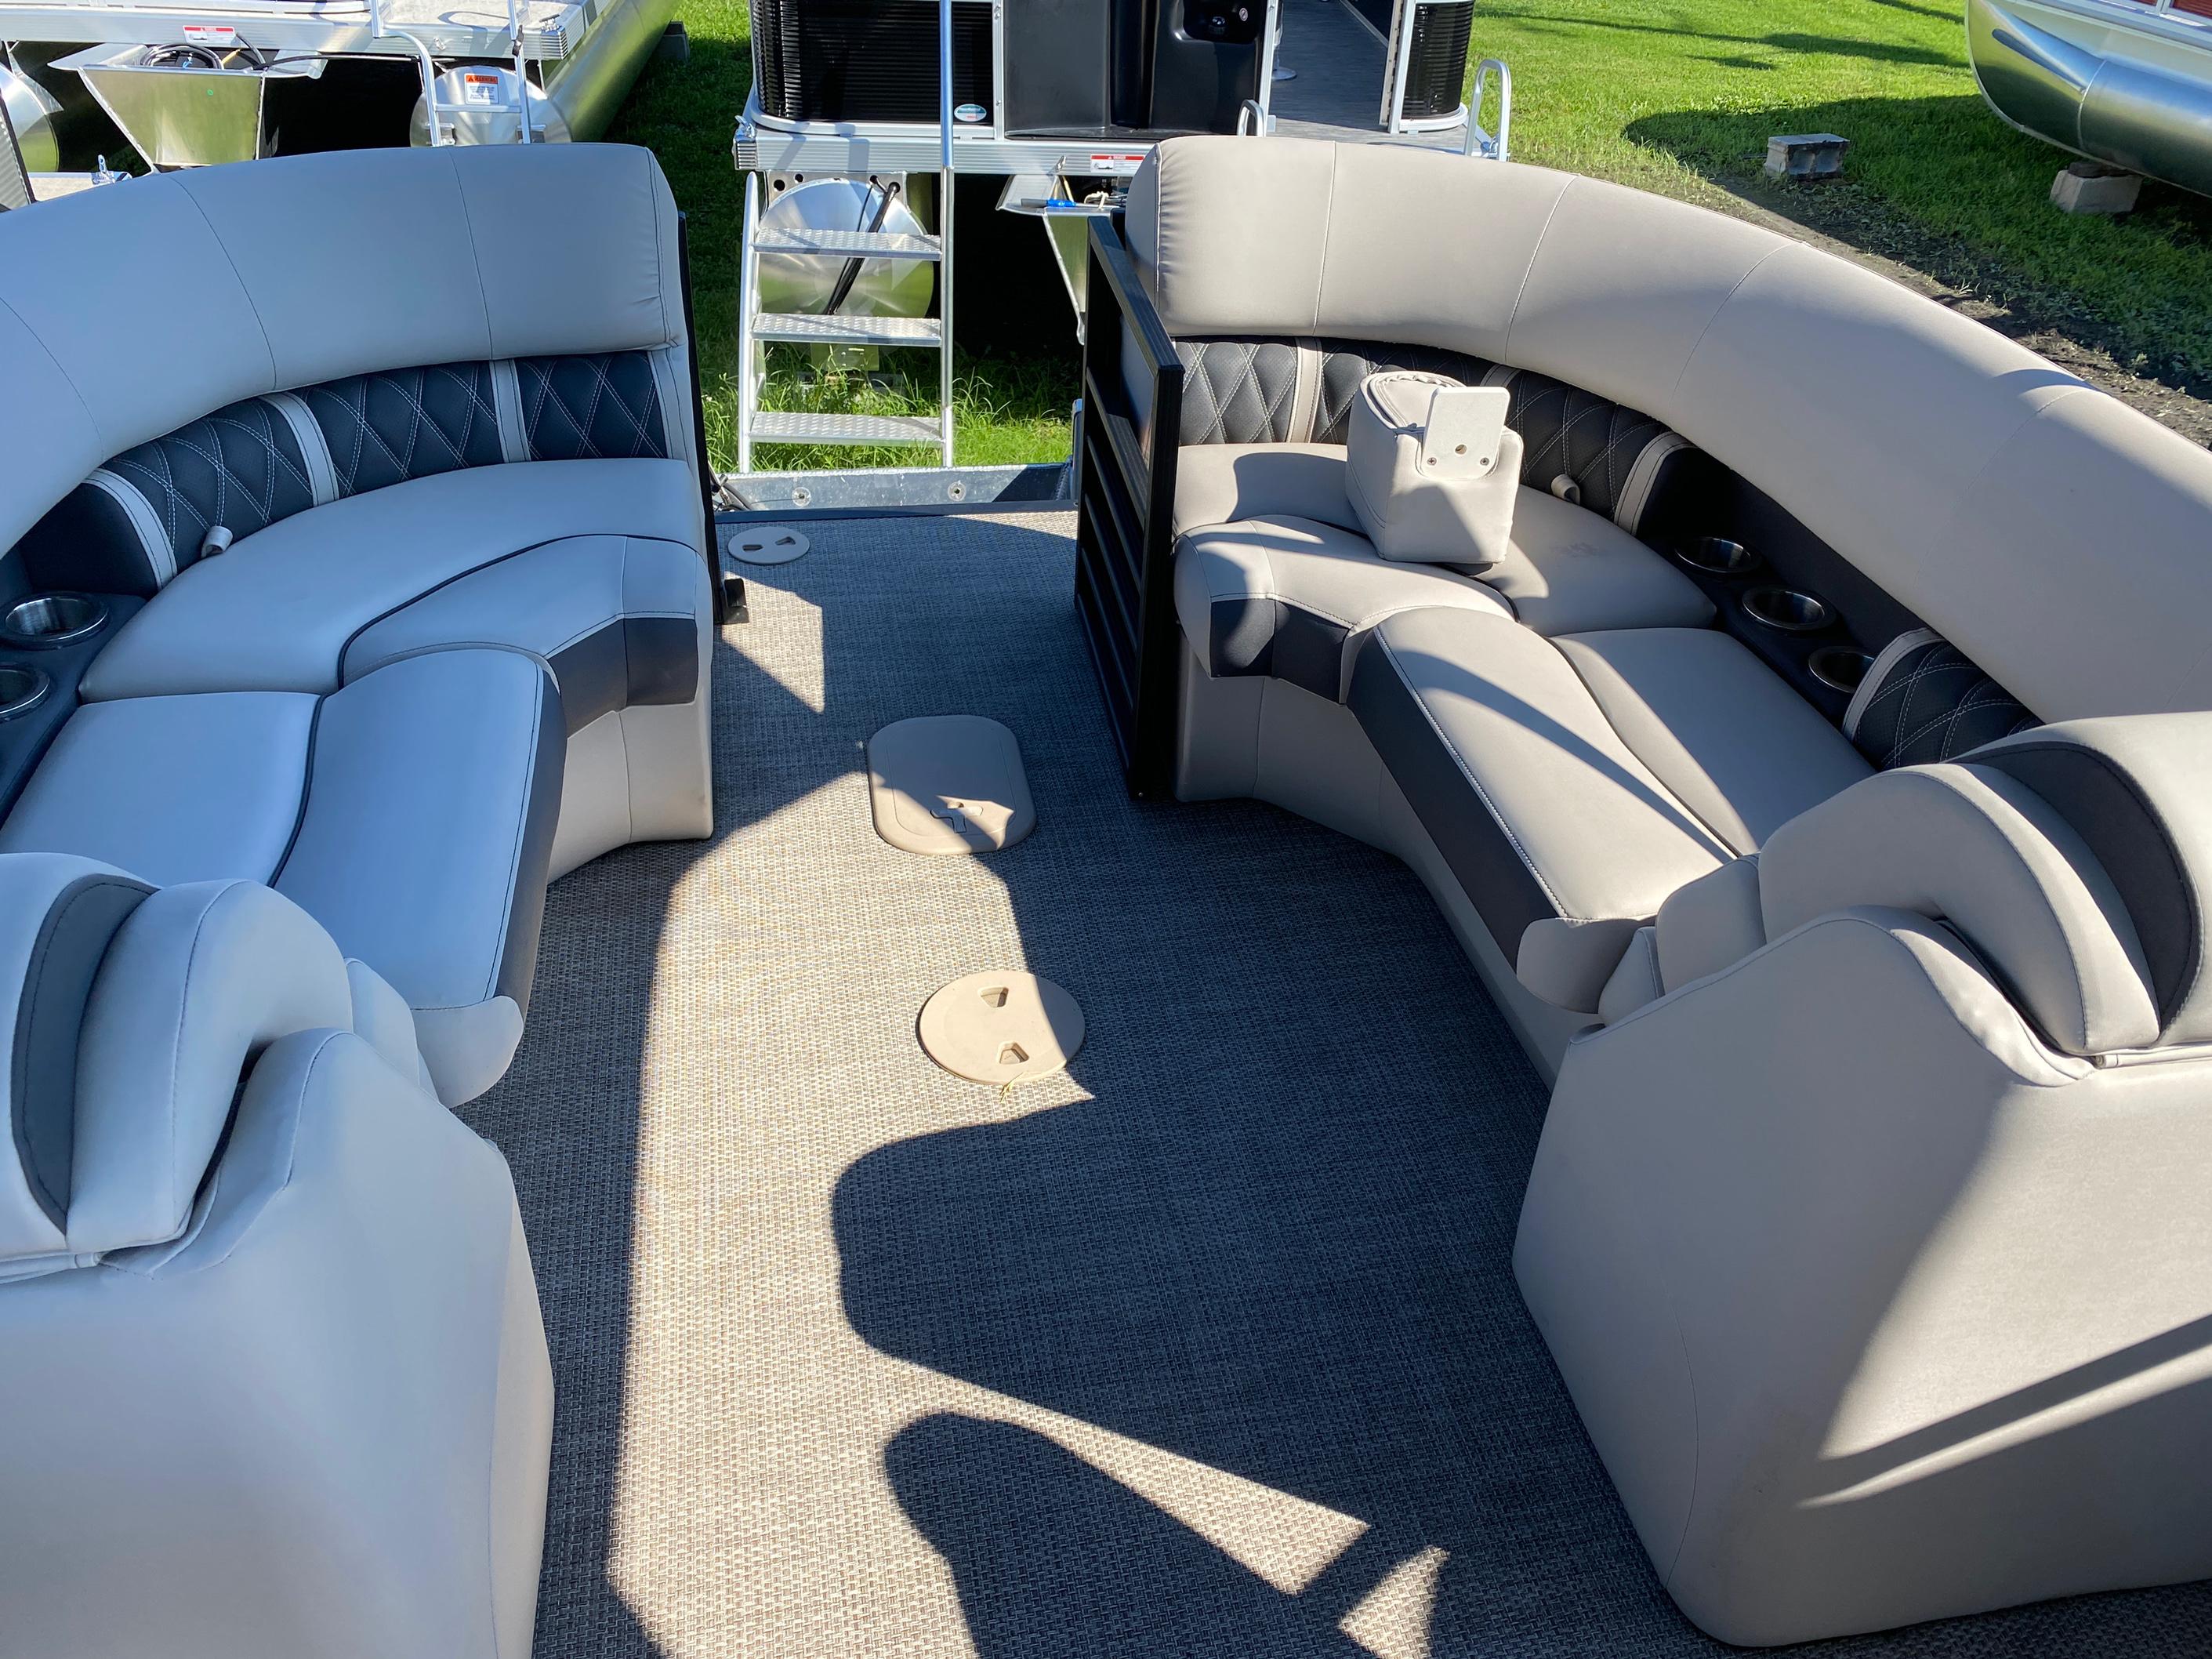 2019 Bennington boat for sale, model of the boat is 23 GSR & Image # 2 of 10